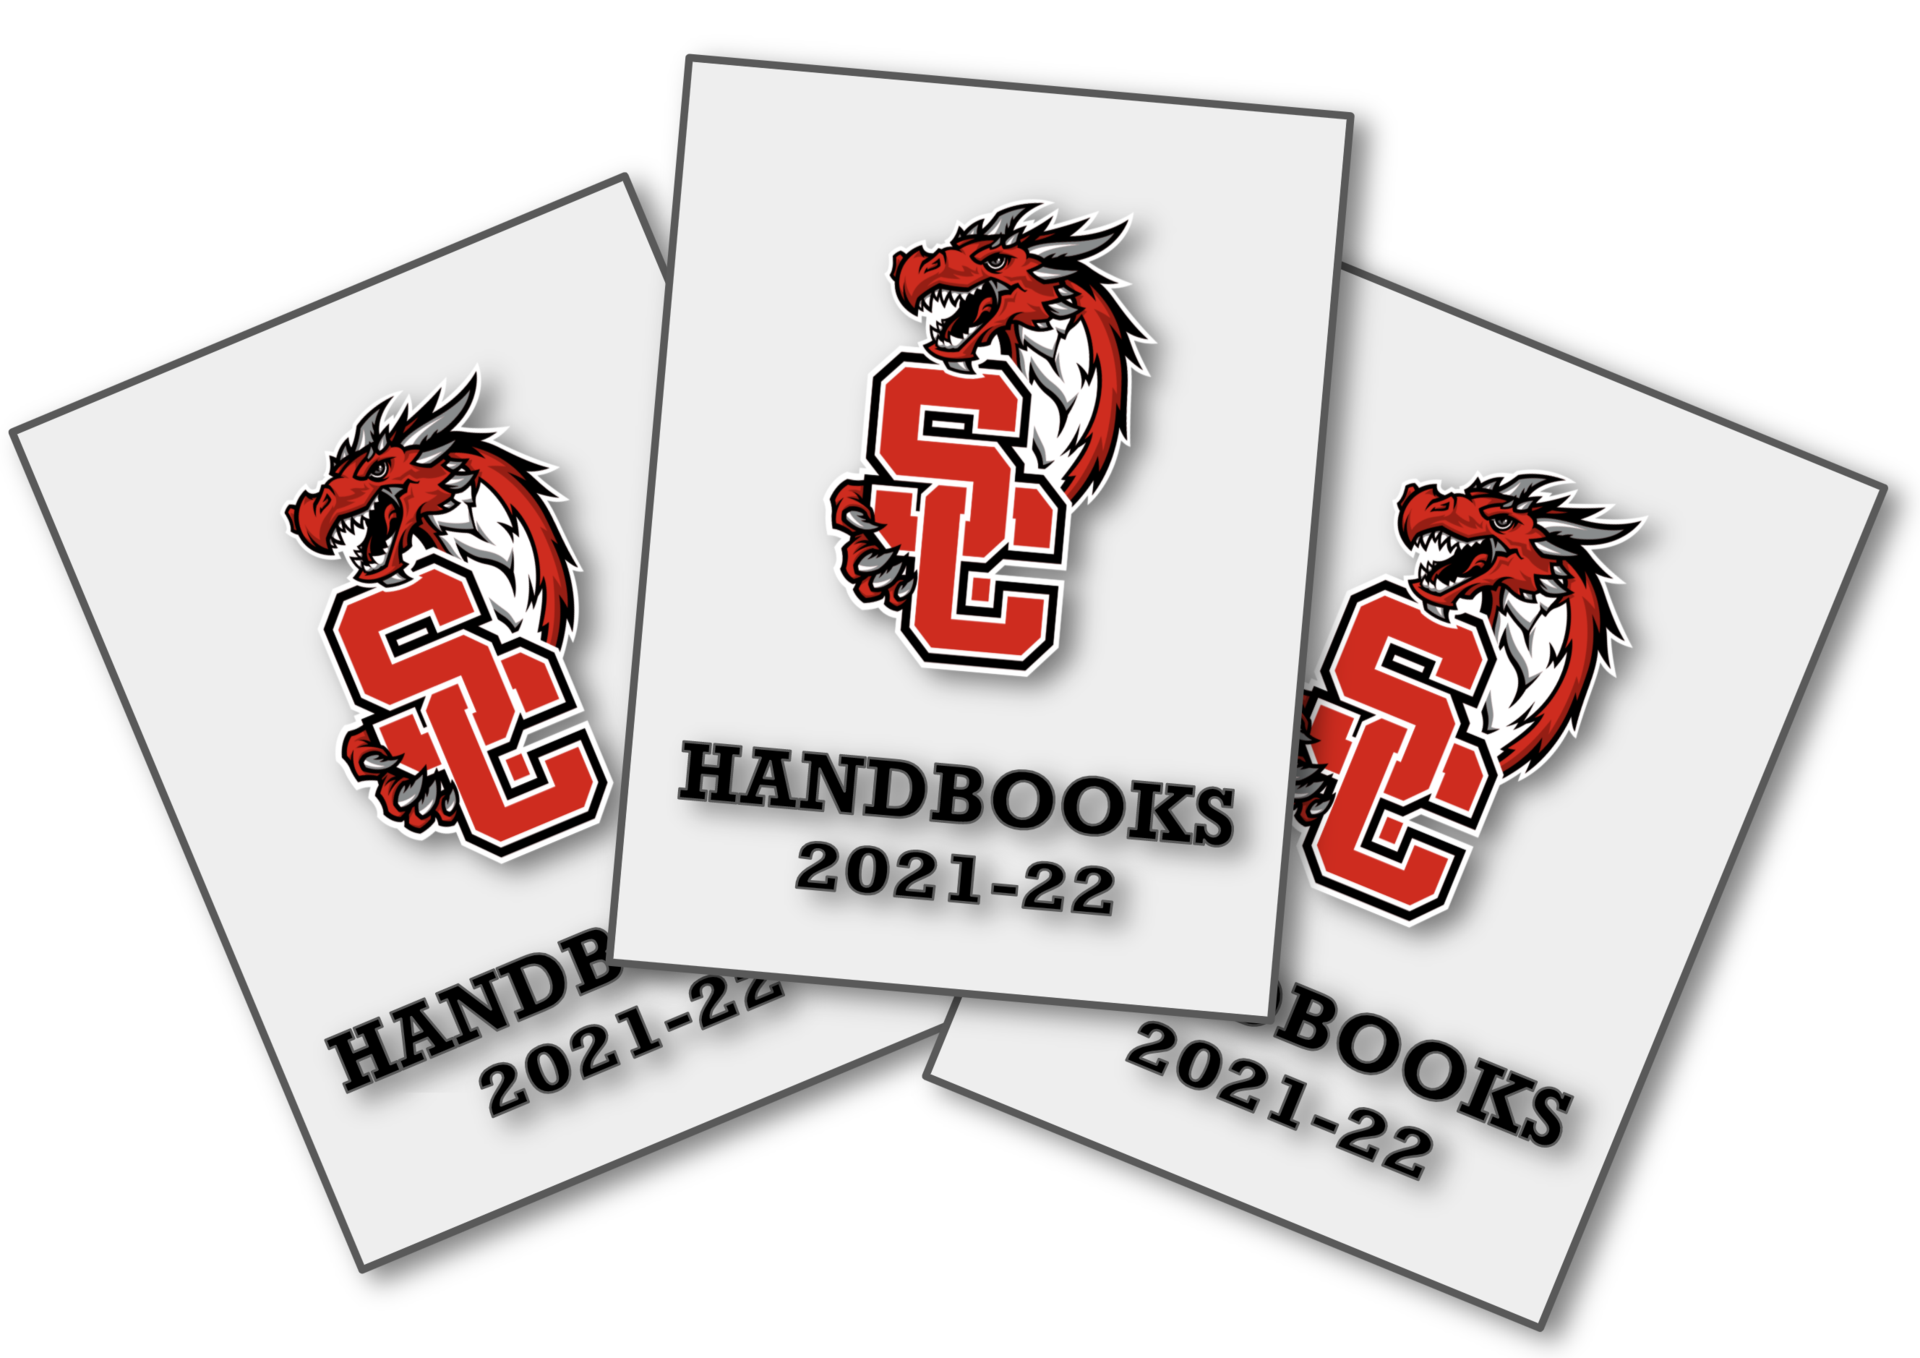 Three Parent-Student Handbooks overlapping each other.